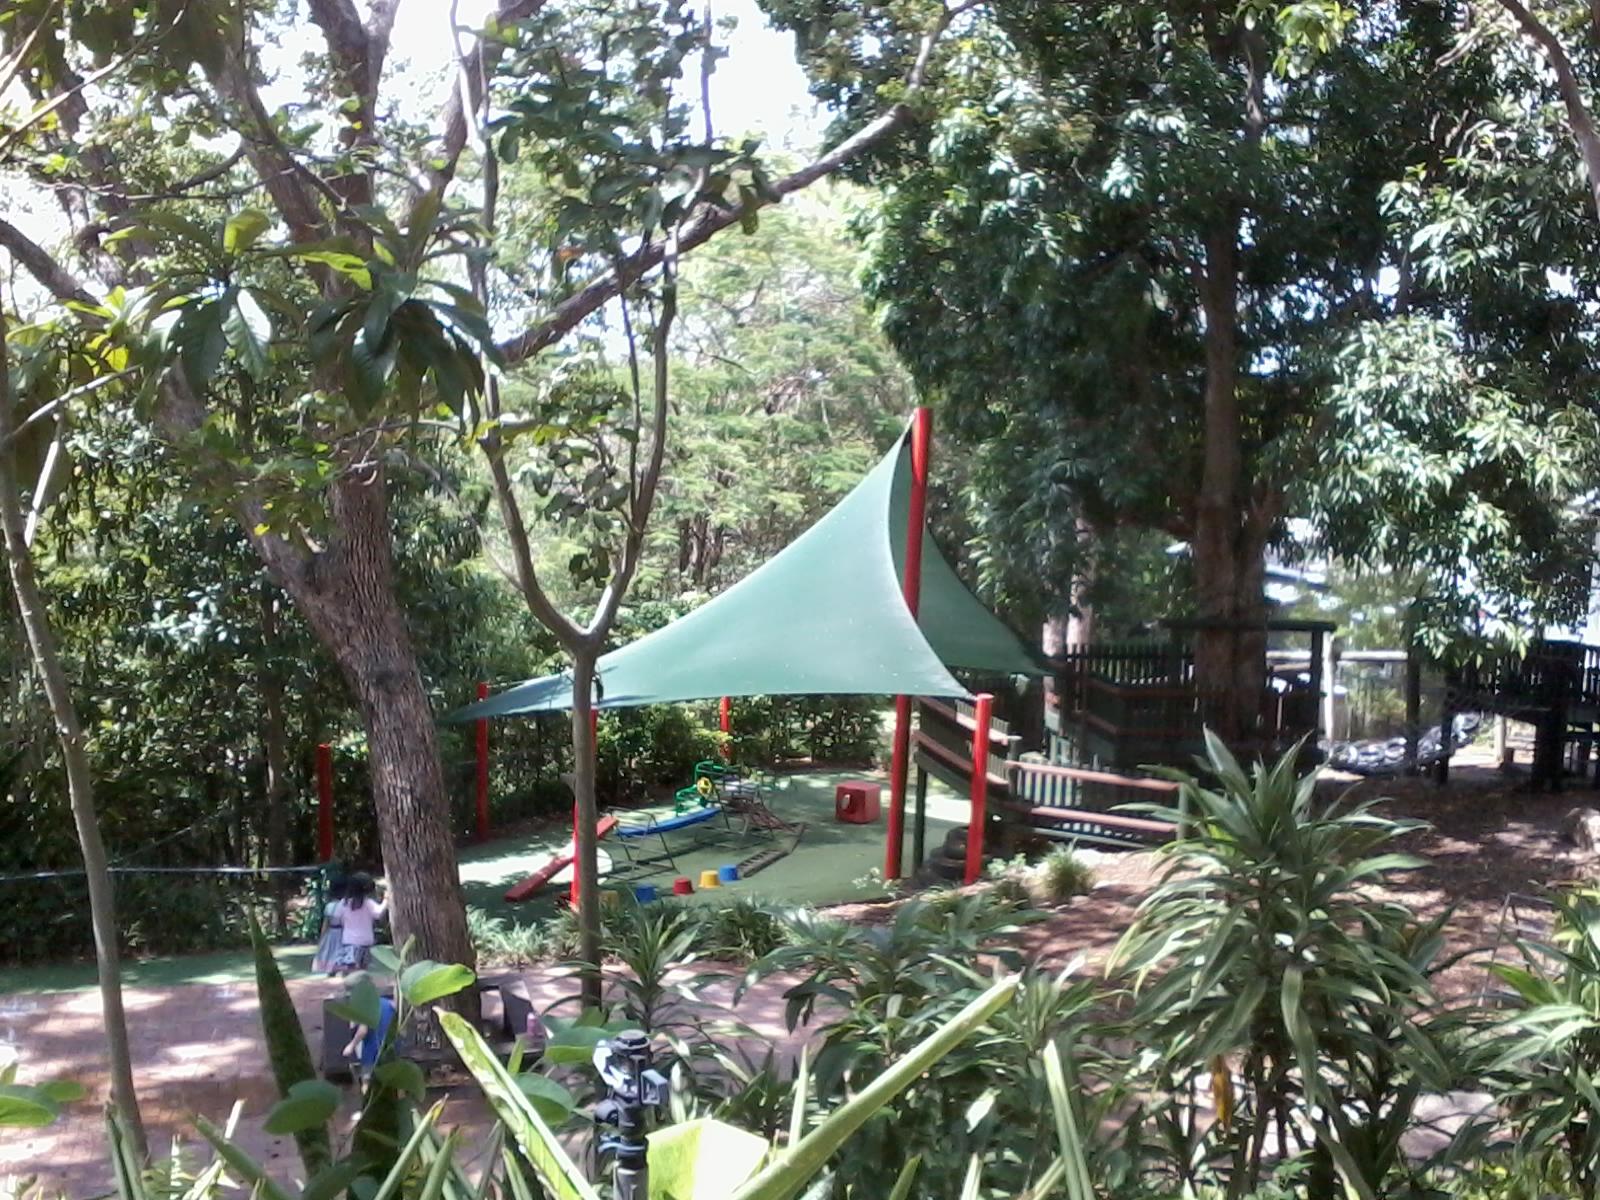 Visita a tres jardines infantiles en Brisbane, Australia